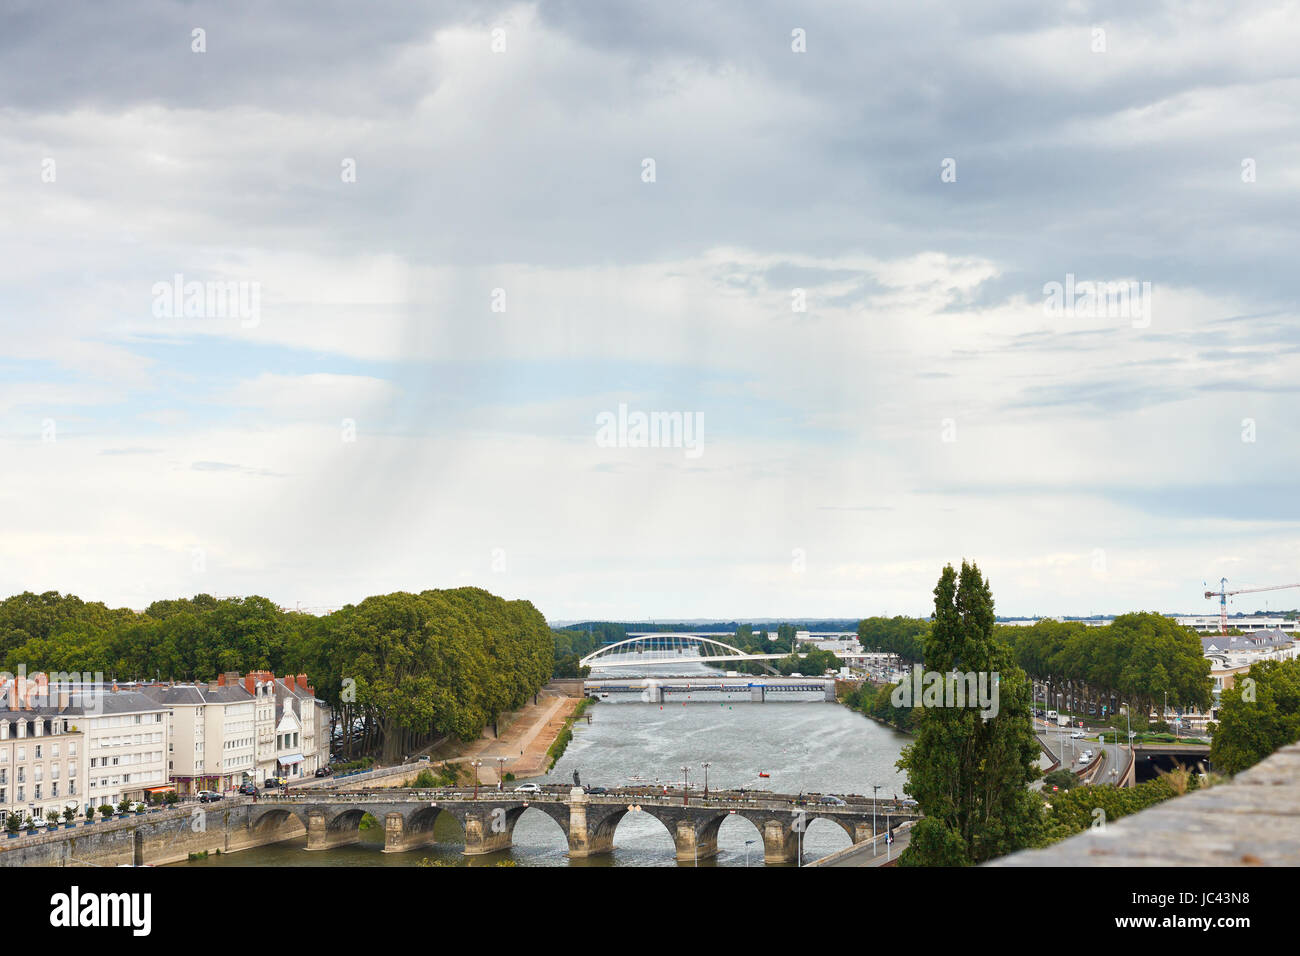 view of bridges Pont de Verdun and Pont de Haute Chaine on La Maine river in Angers, France in rainy day - Stock Image